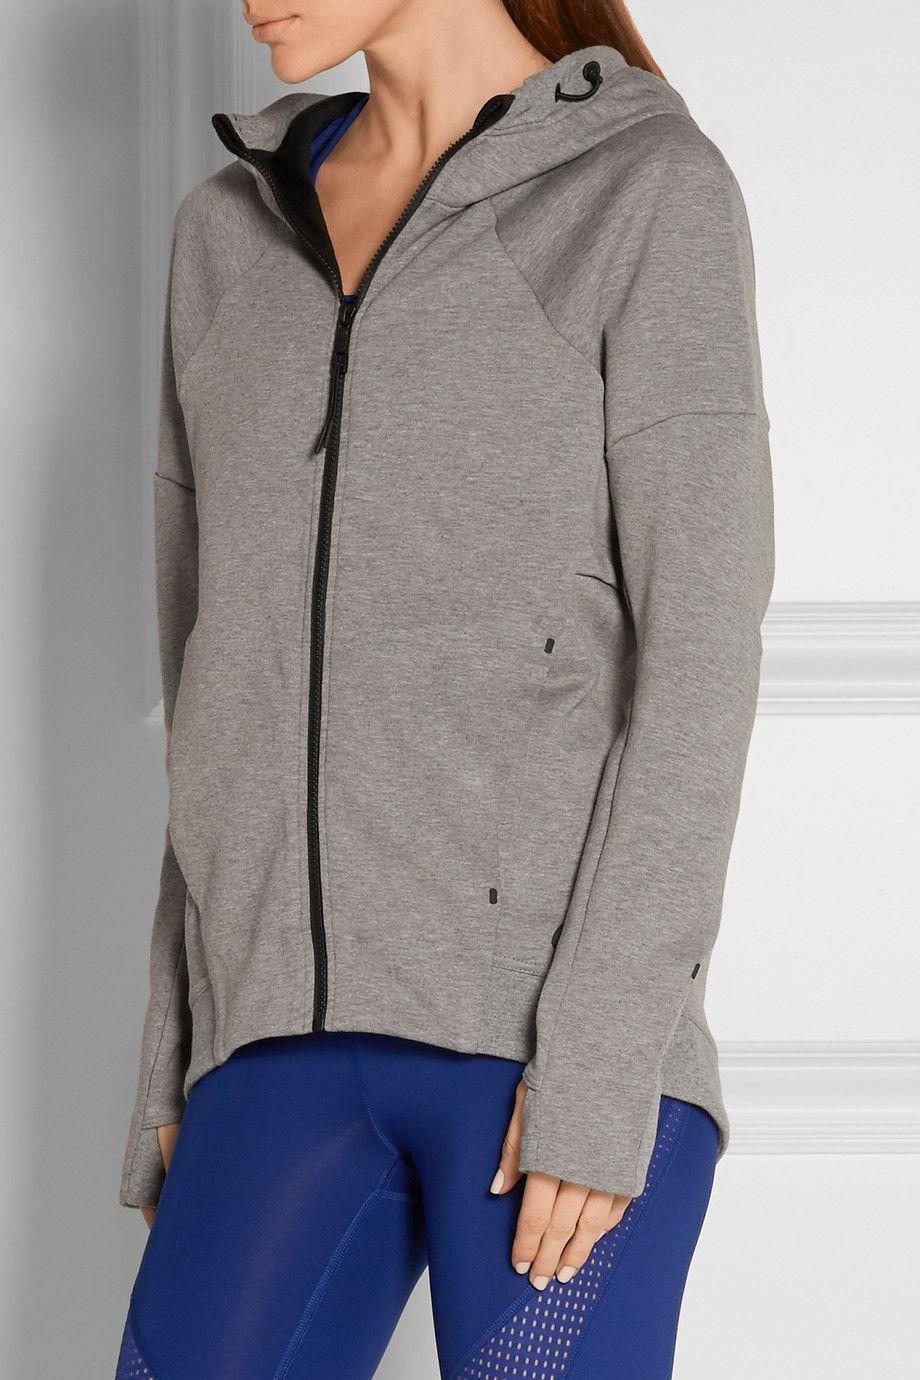 Nike Tech Fleece cottonblend jersey hooded top